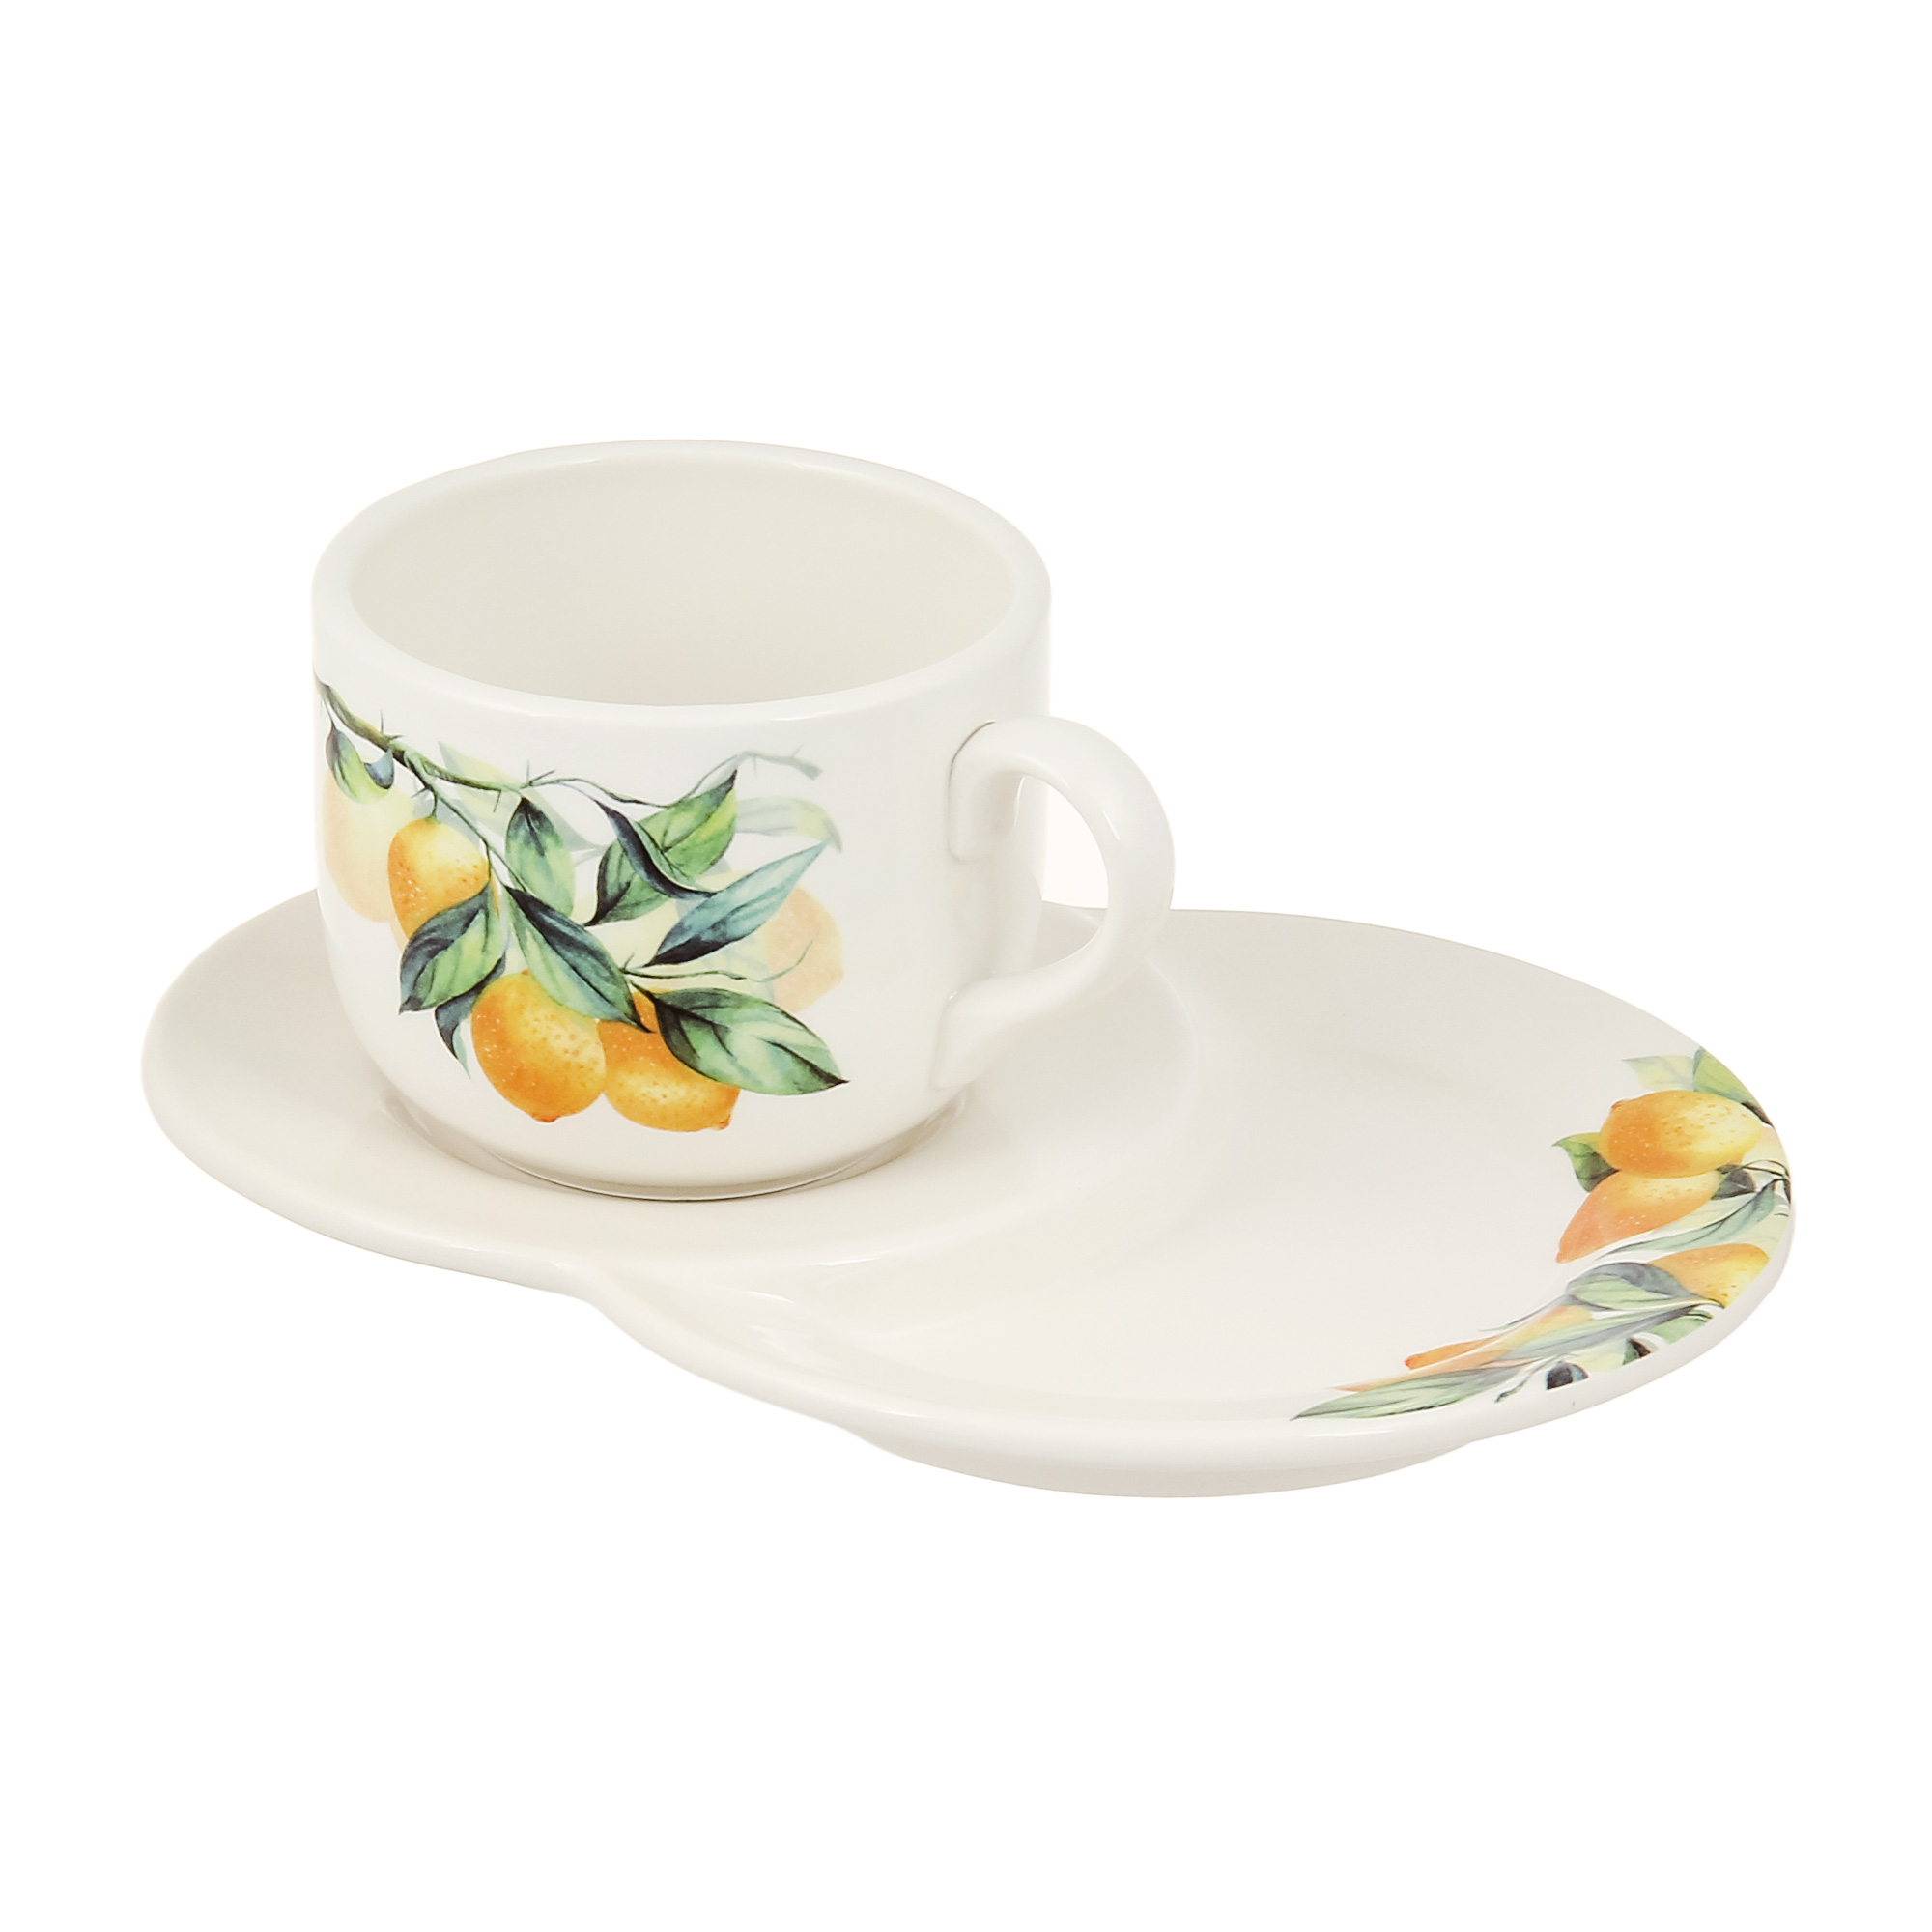 Пара чайная Ceramica cuore lemon 350мл фото